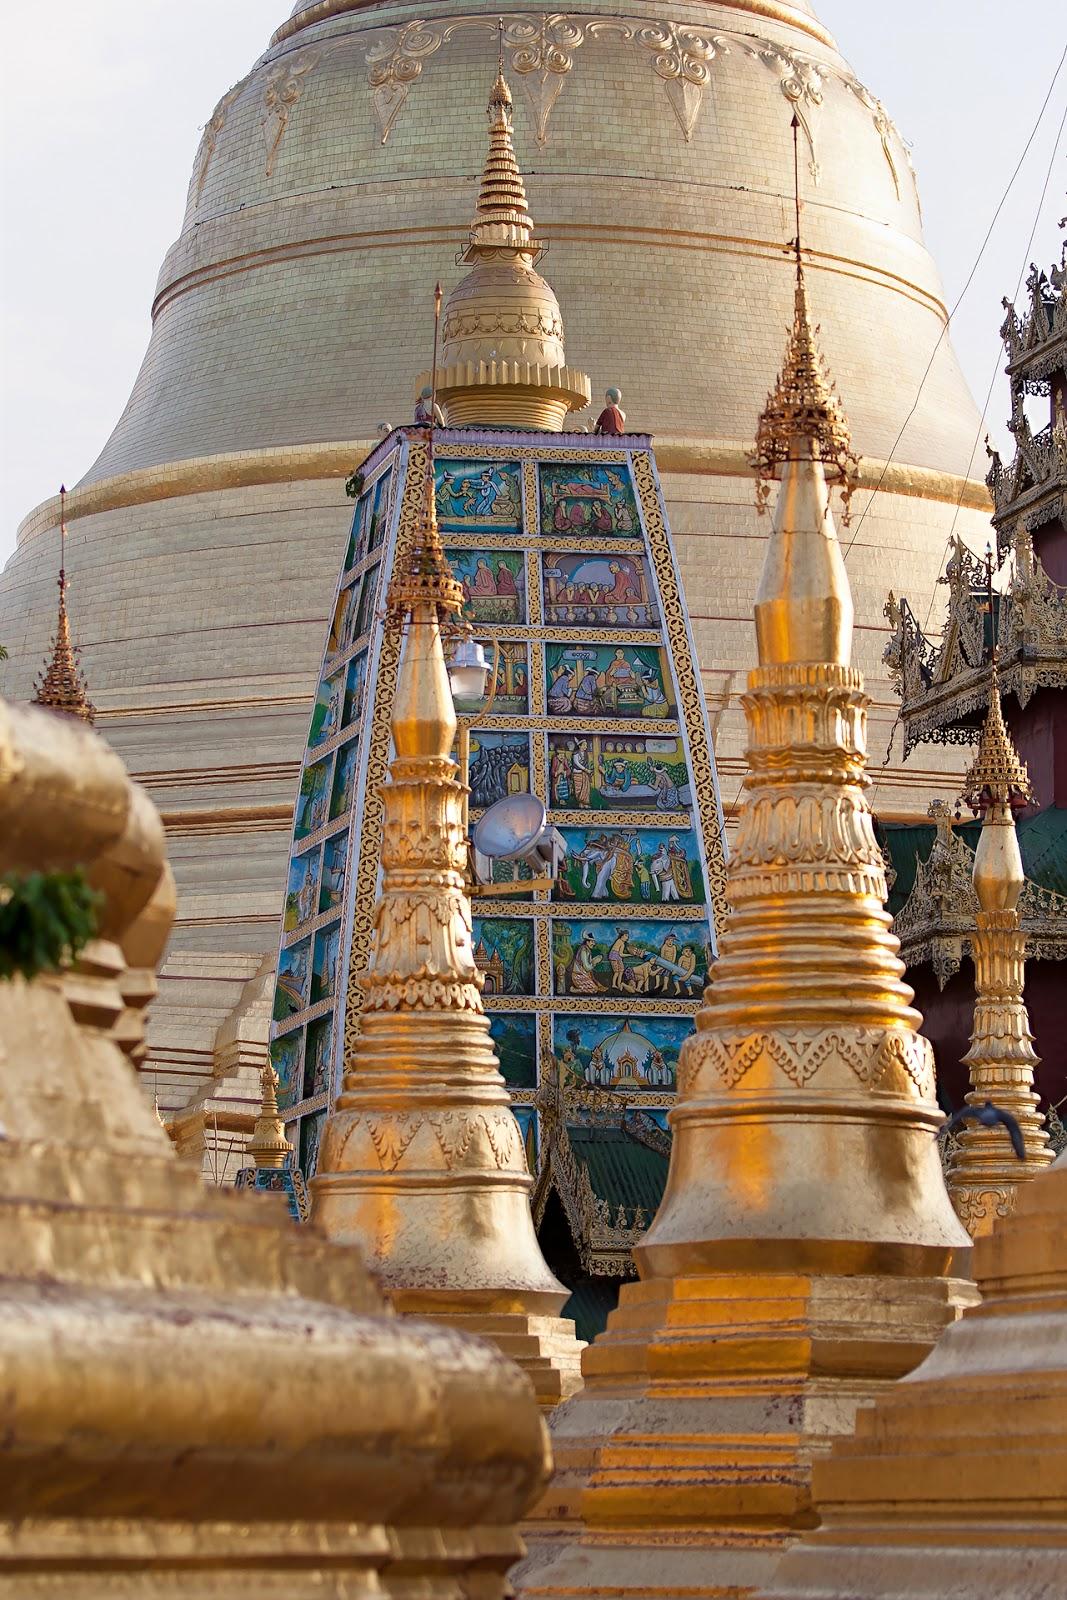 Shwedogon-wpływy hinduskie,myanmar